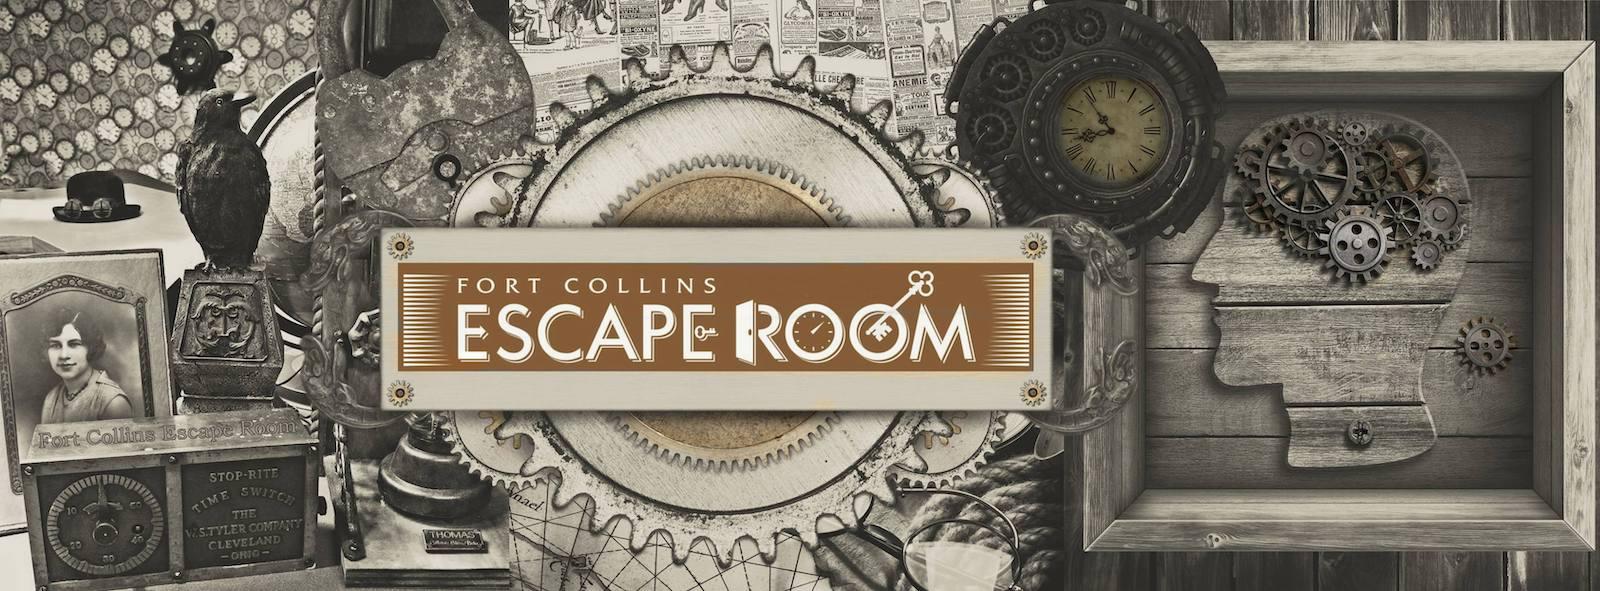 Fort Collins Escape Room, CO